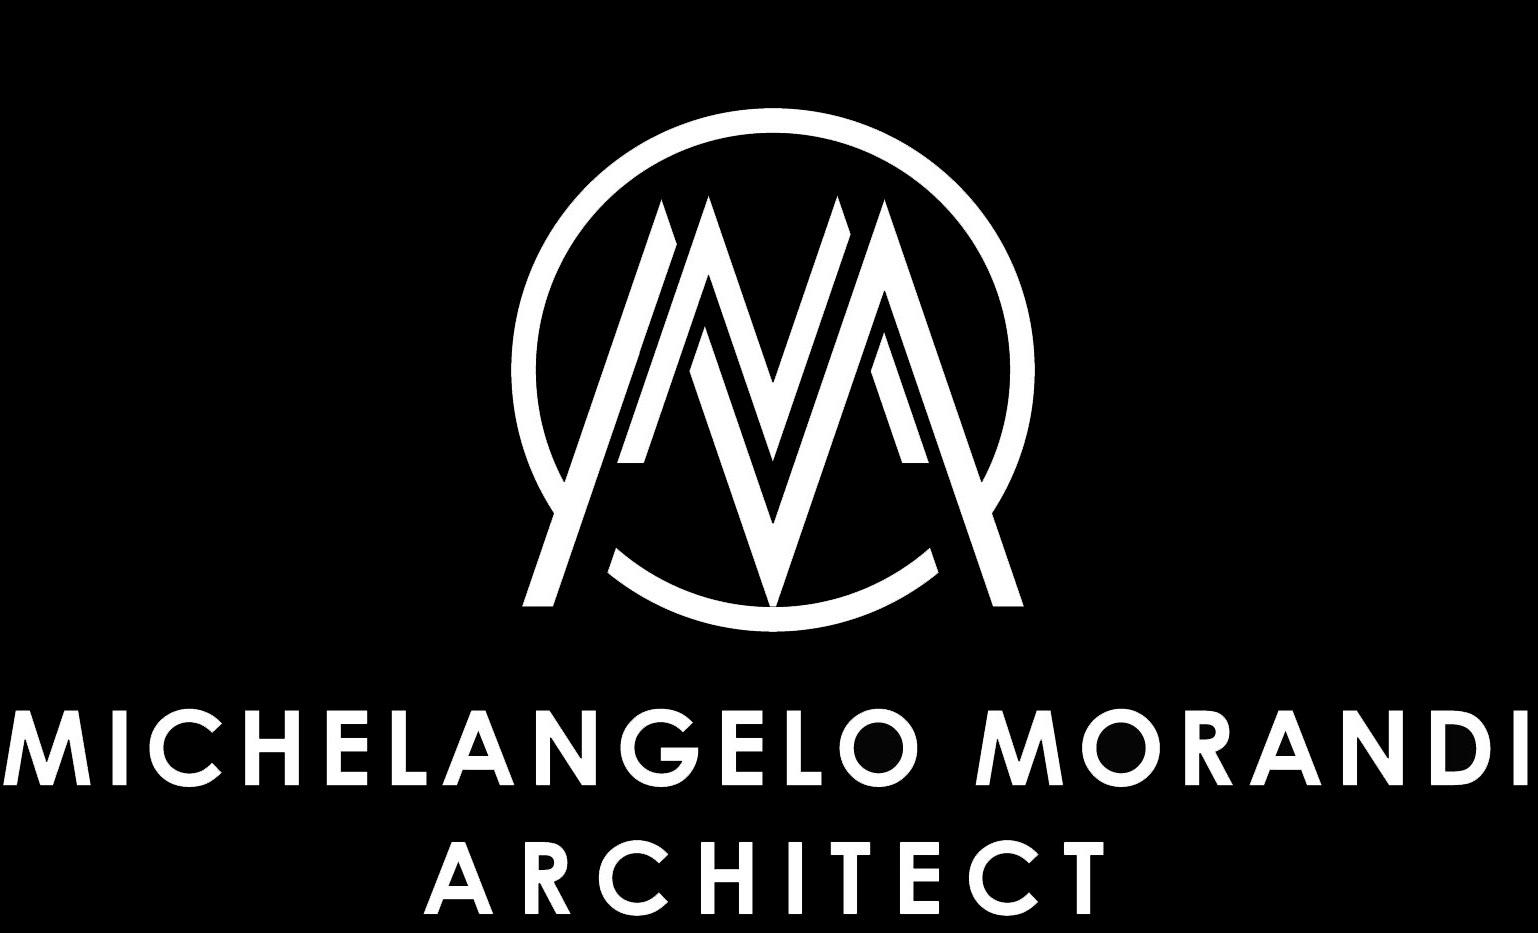 Michelangelo Morandi